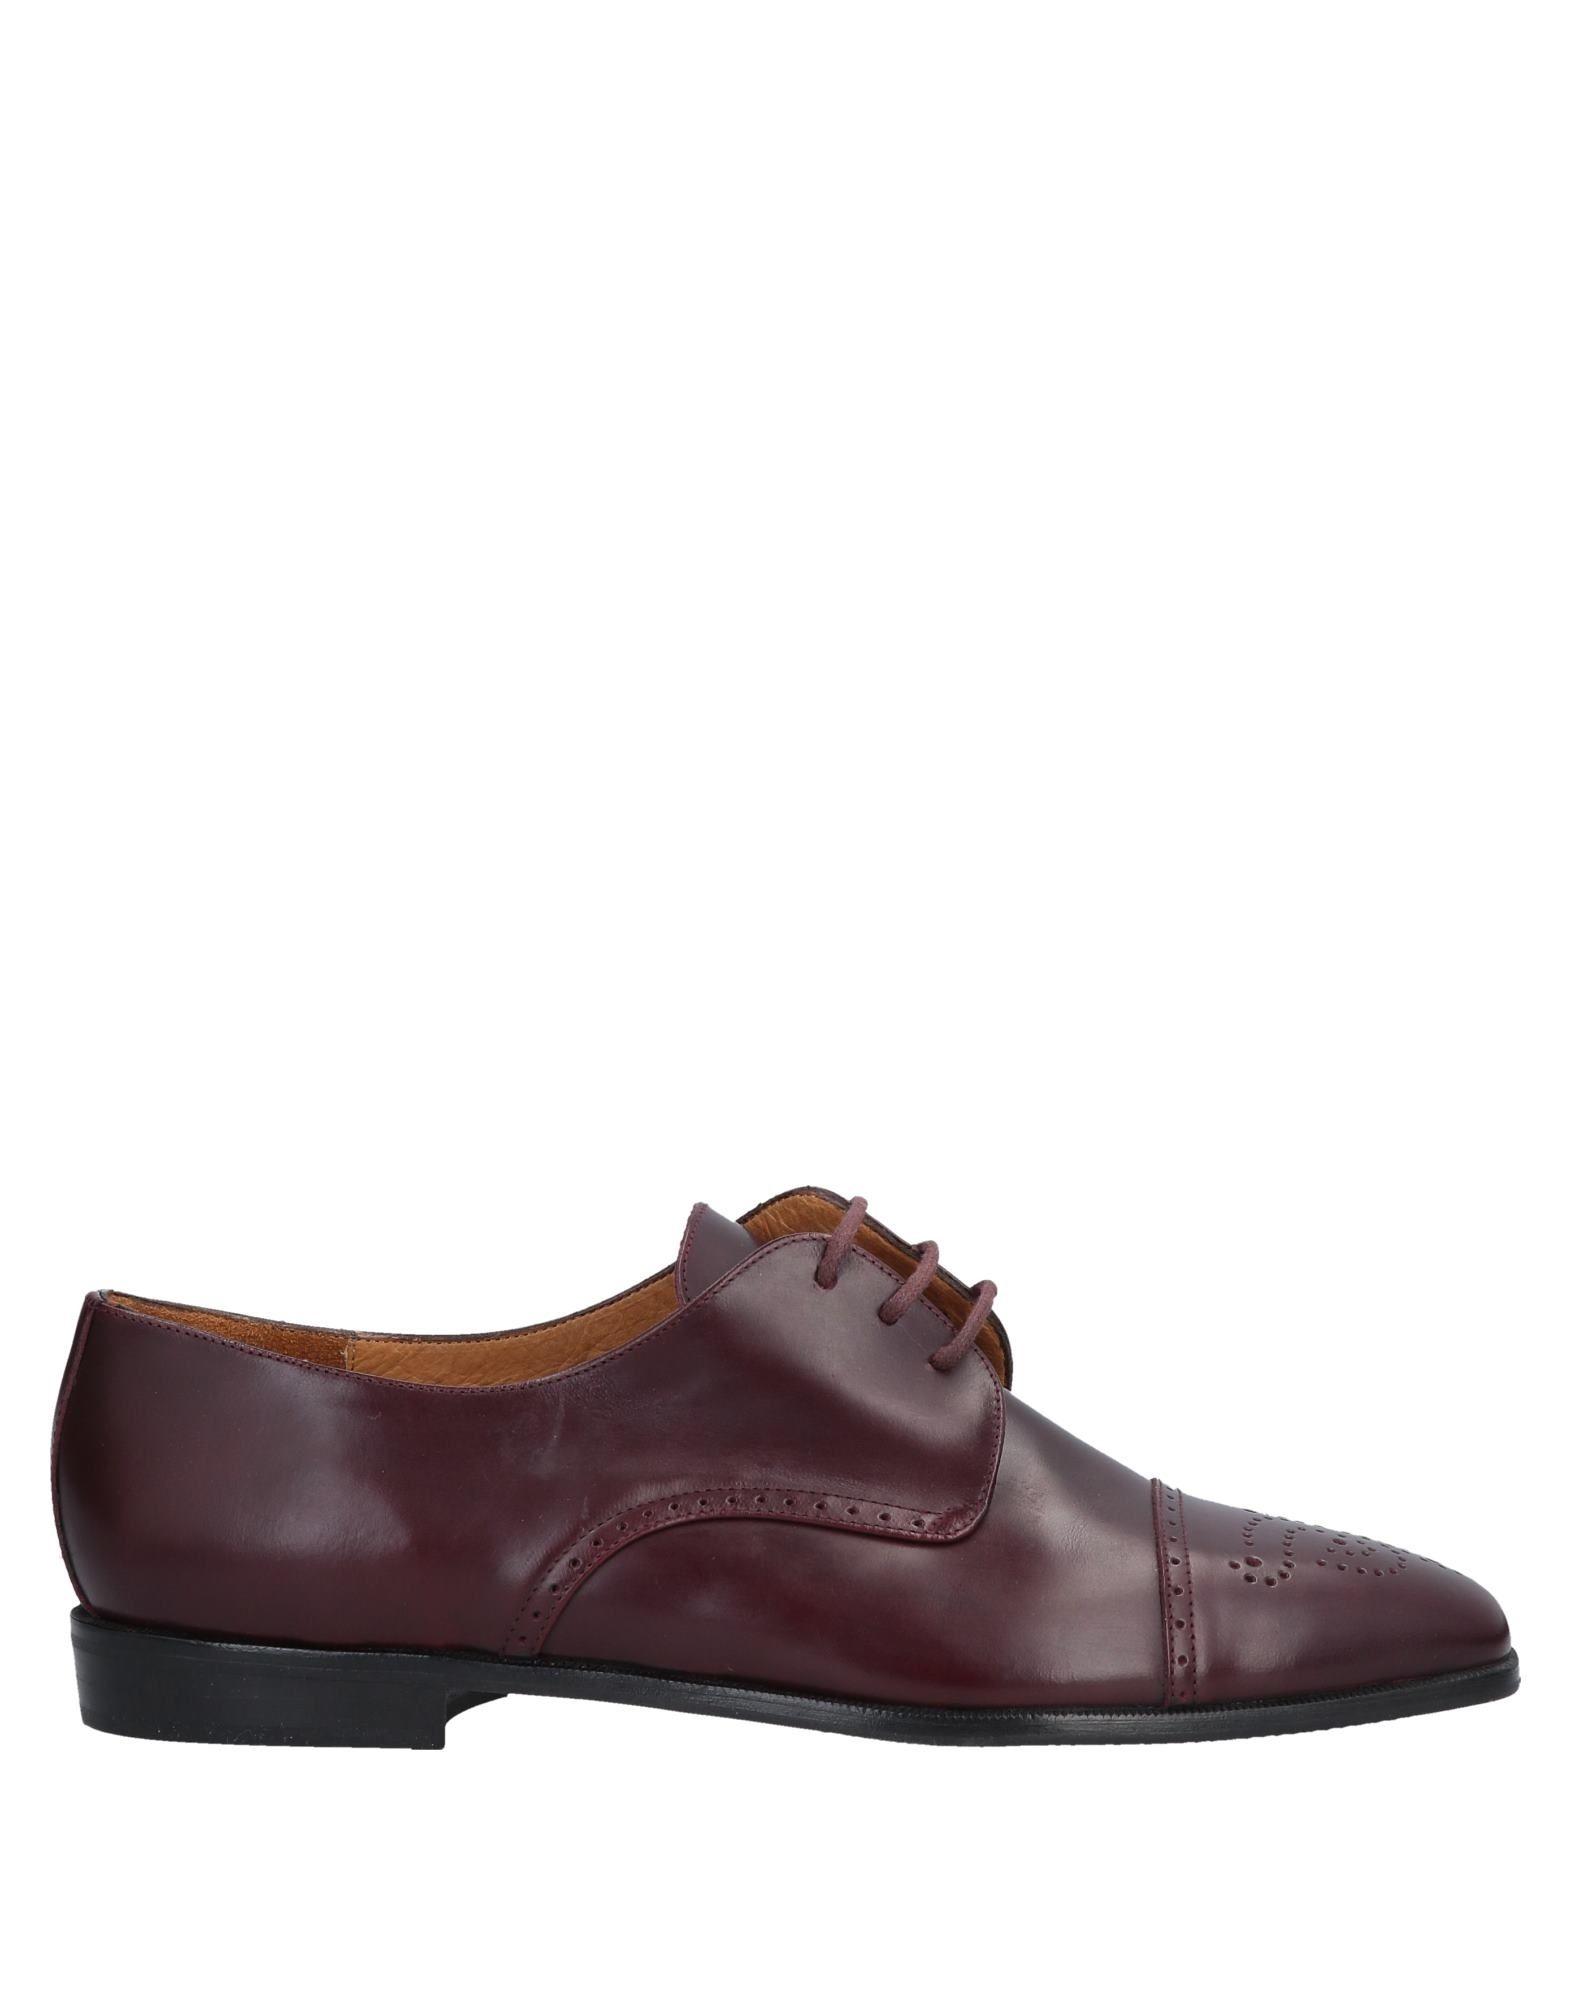 7b7e730d3754 Moda Italia shoes for women